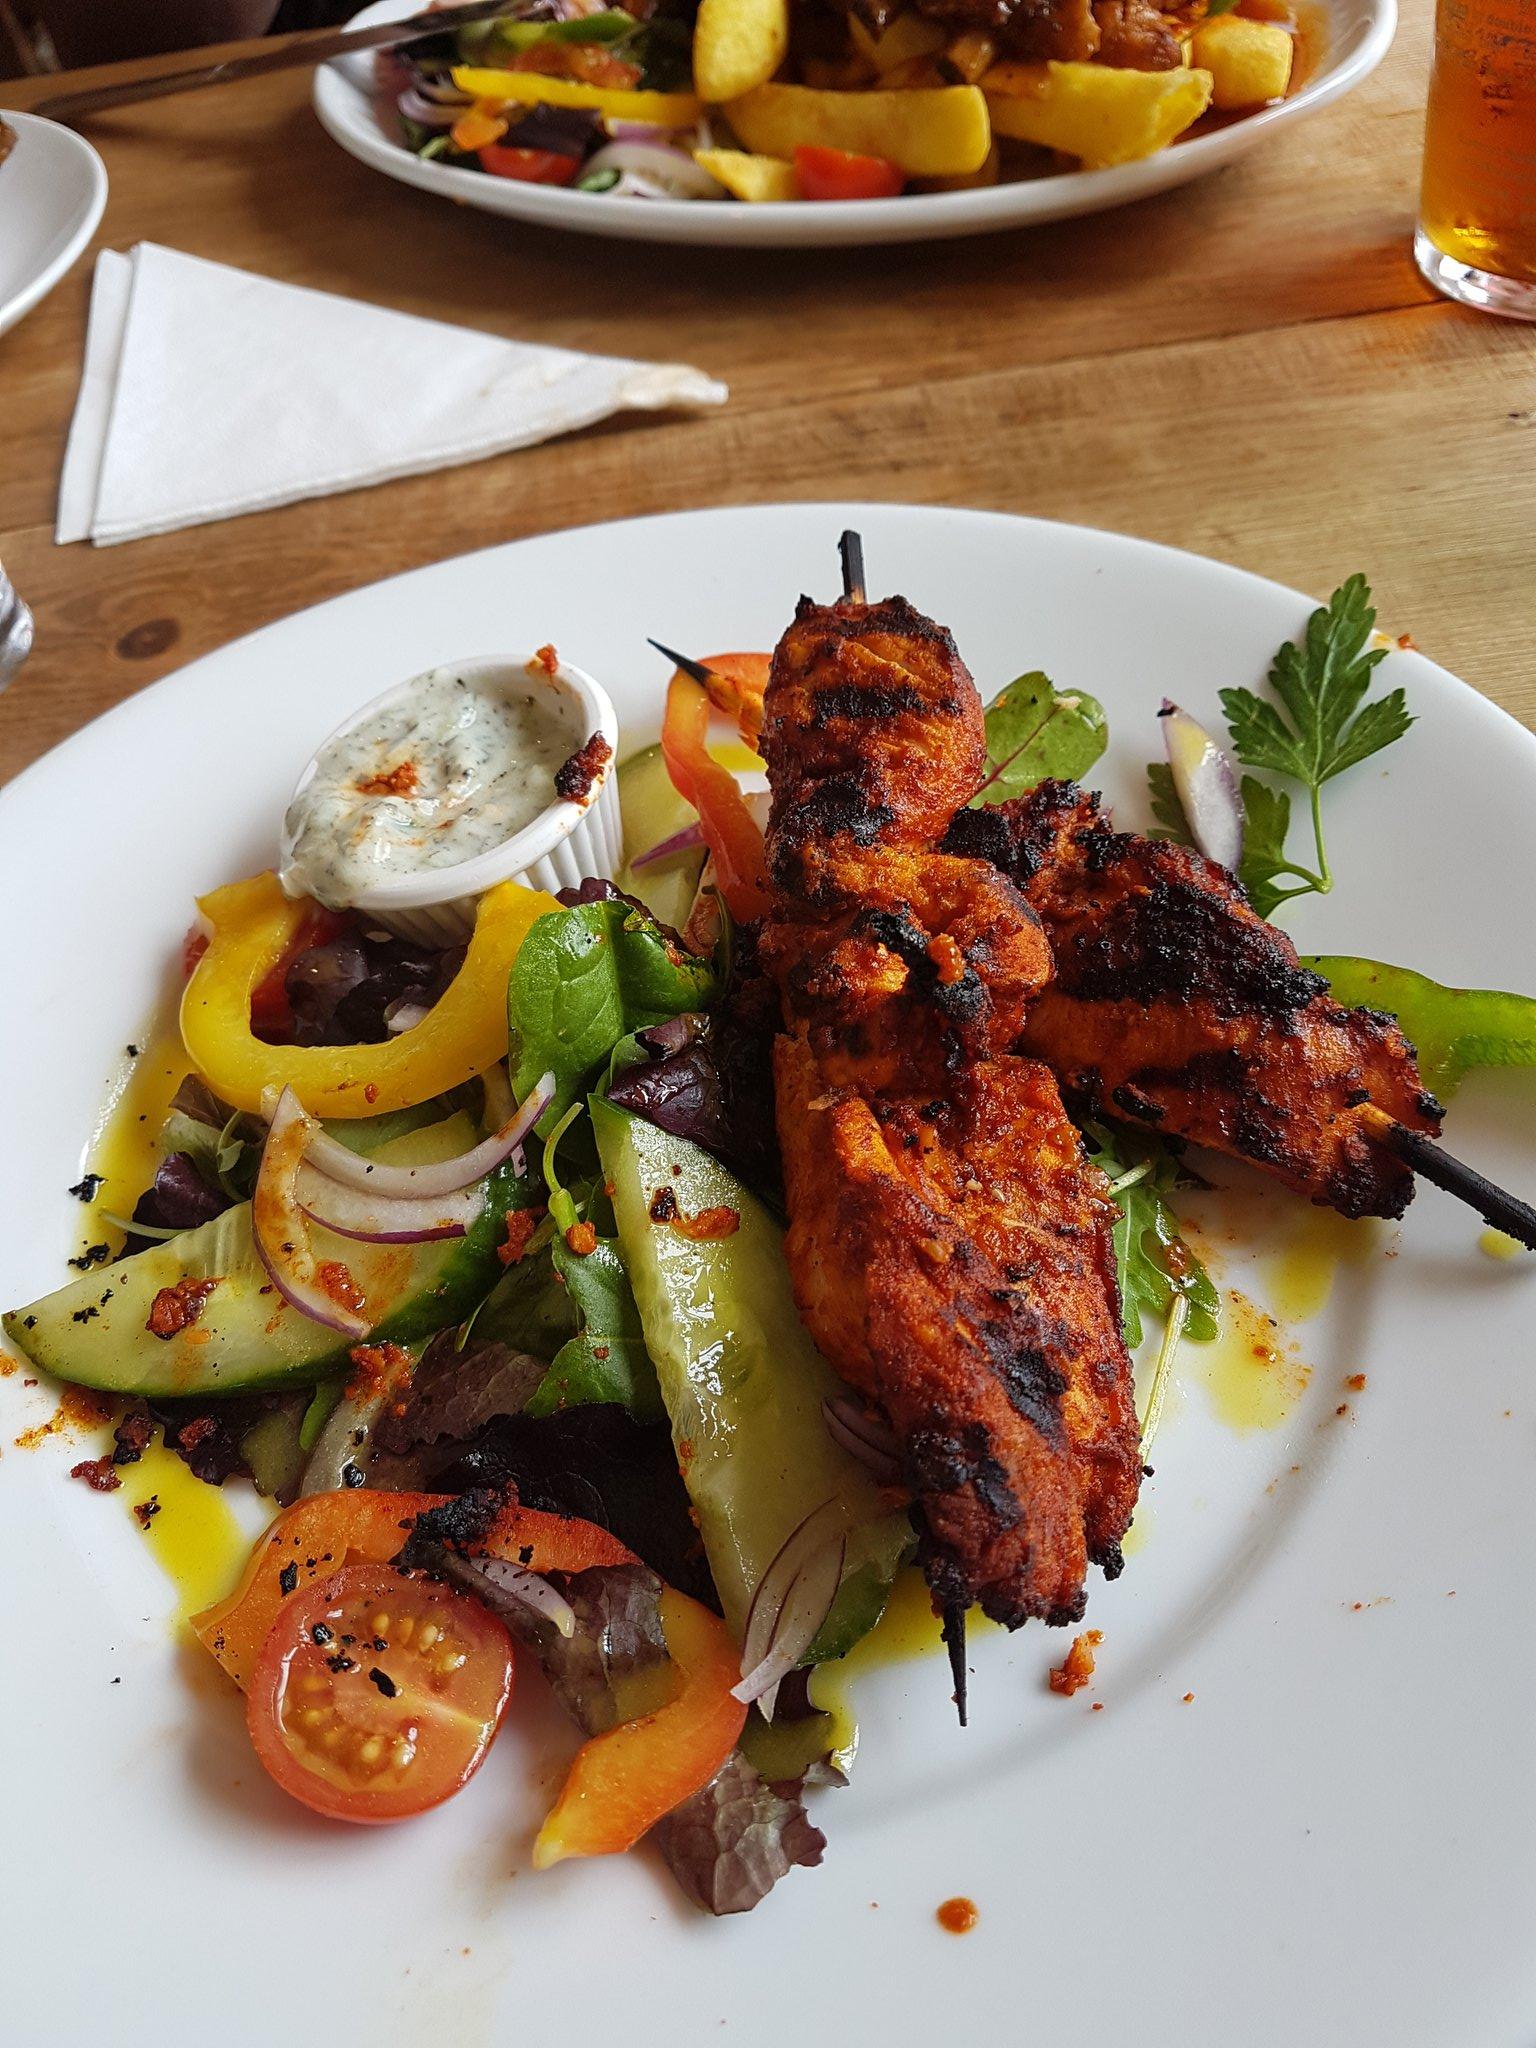 I am having a healthier lunch at the Propellor Inn at Bembridge https://t.co/0wpZyFRH8z